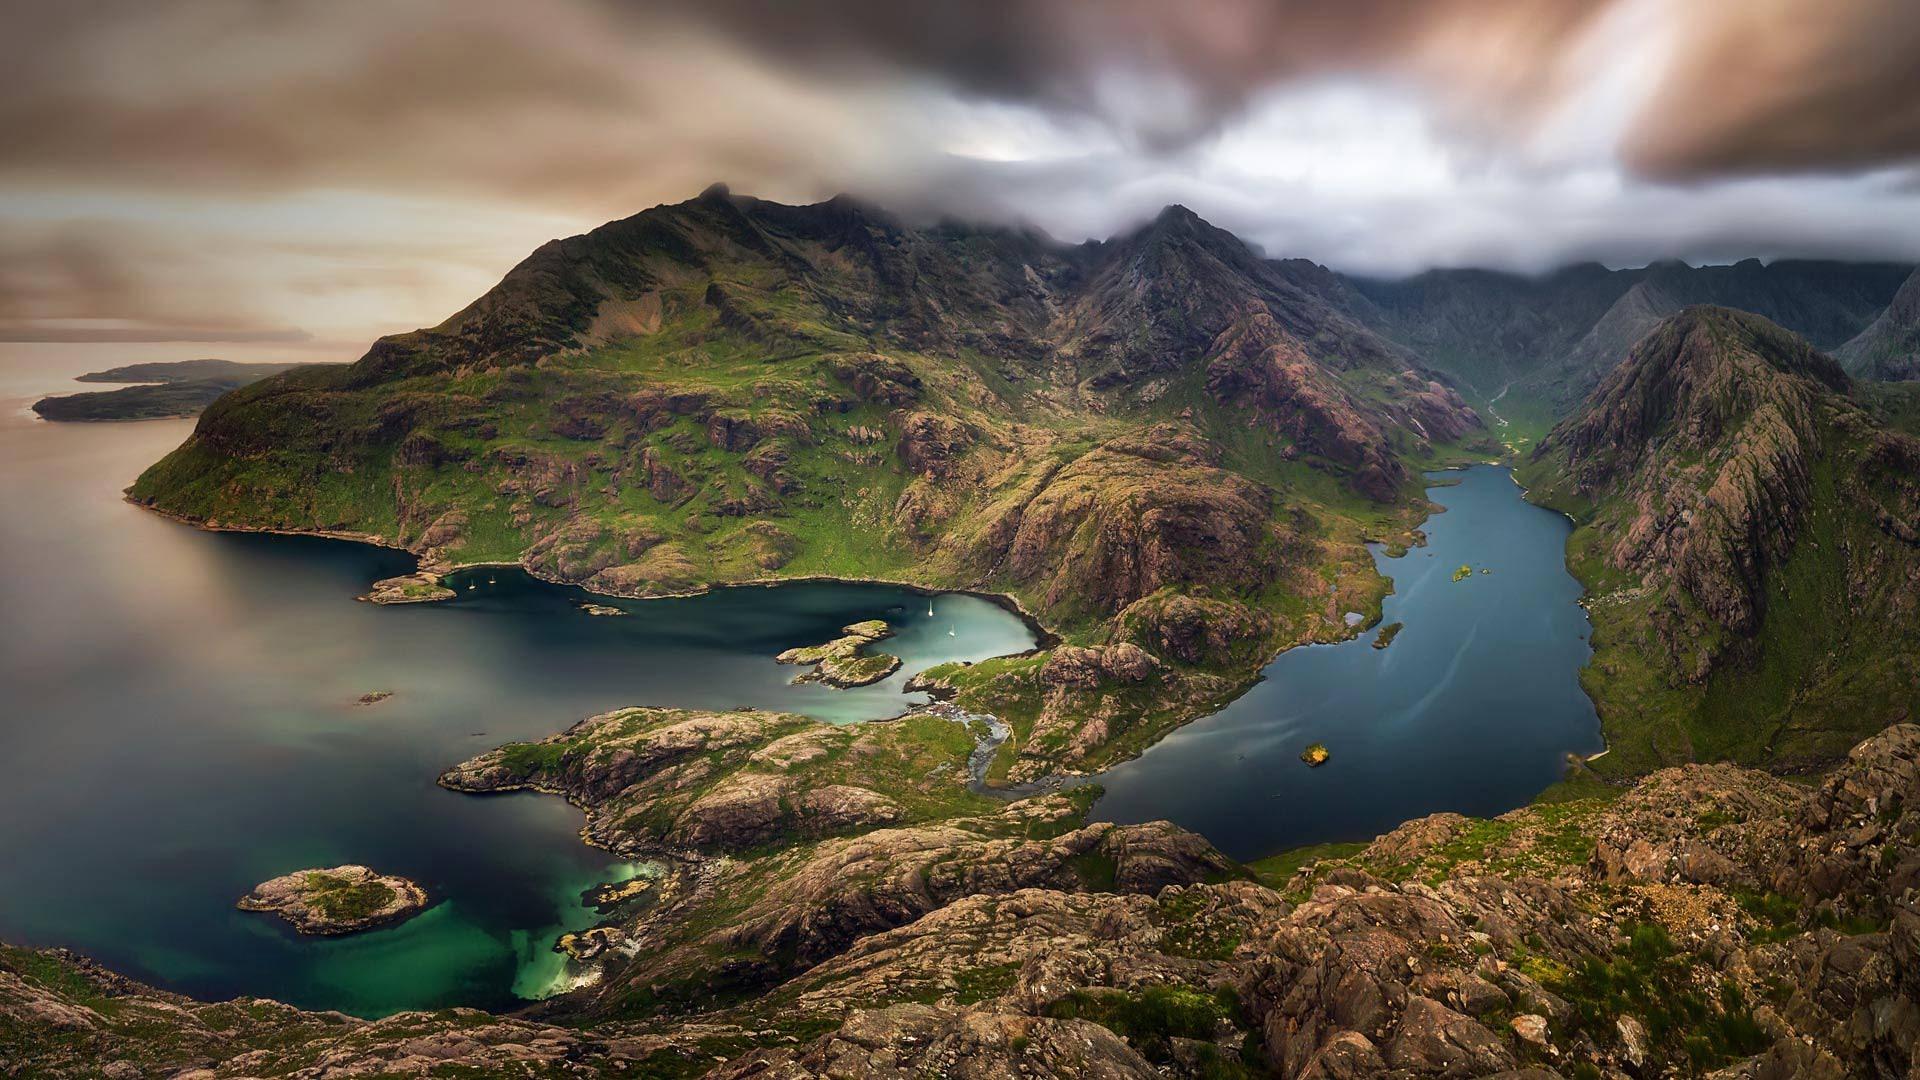 Wallpaper Scotland Isle Of Skye Mountains Sea Top View 1920x1080